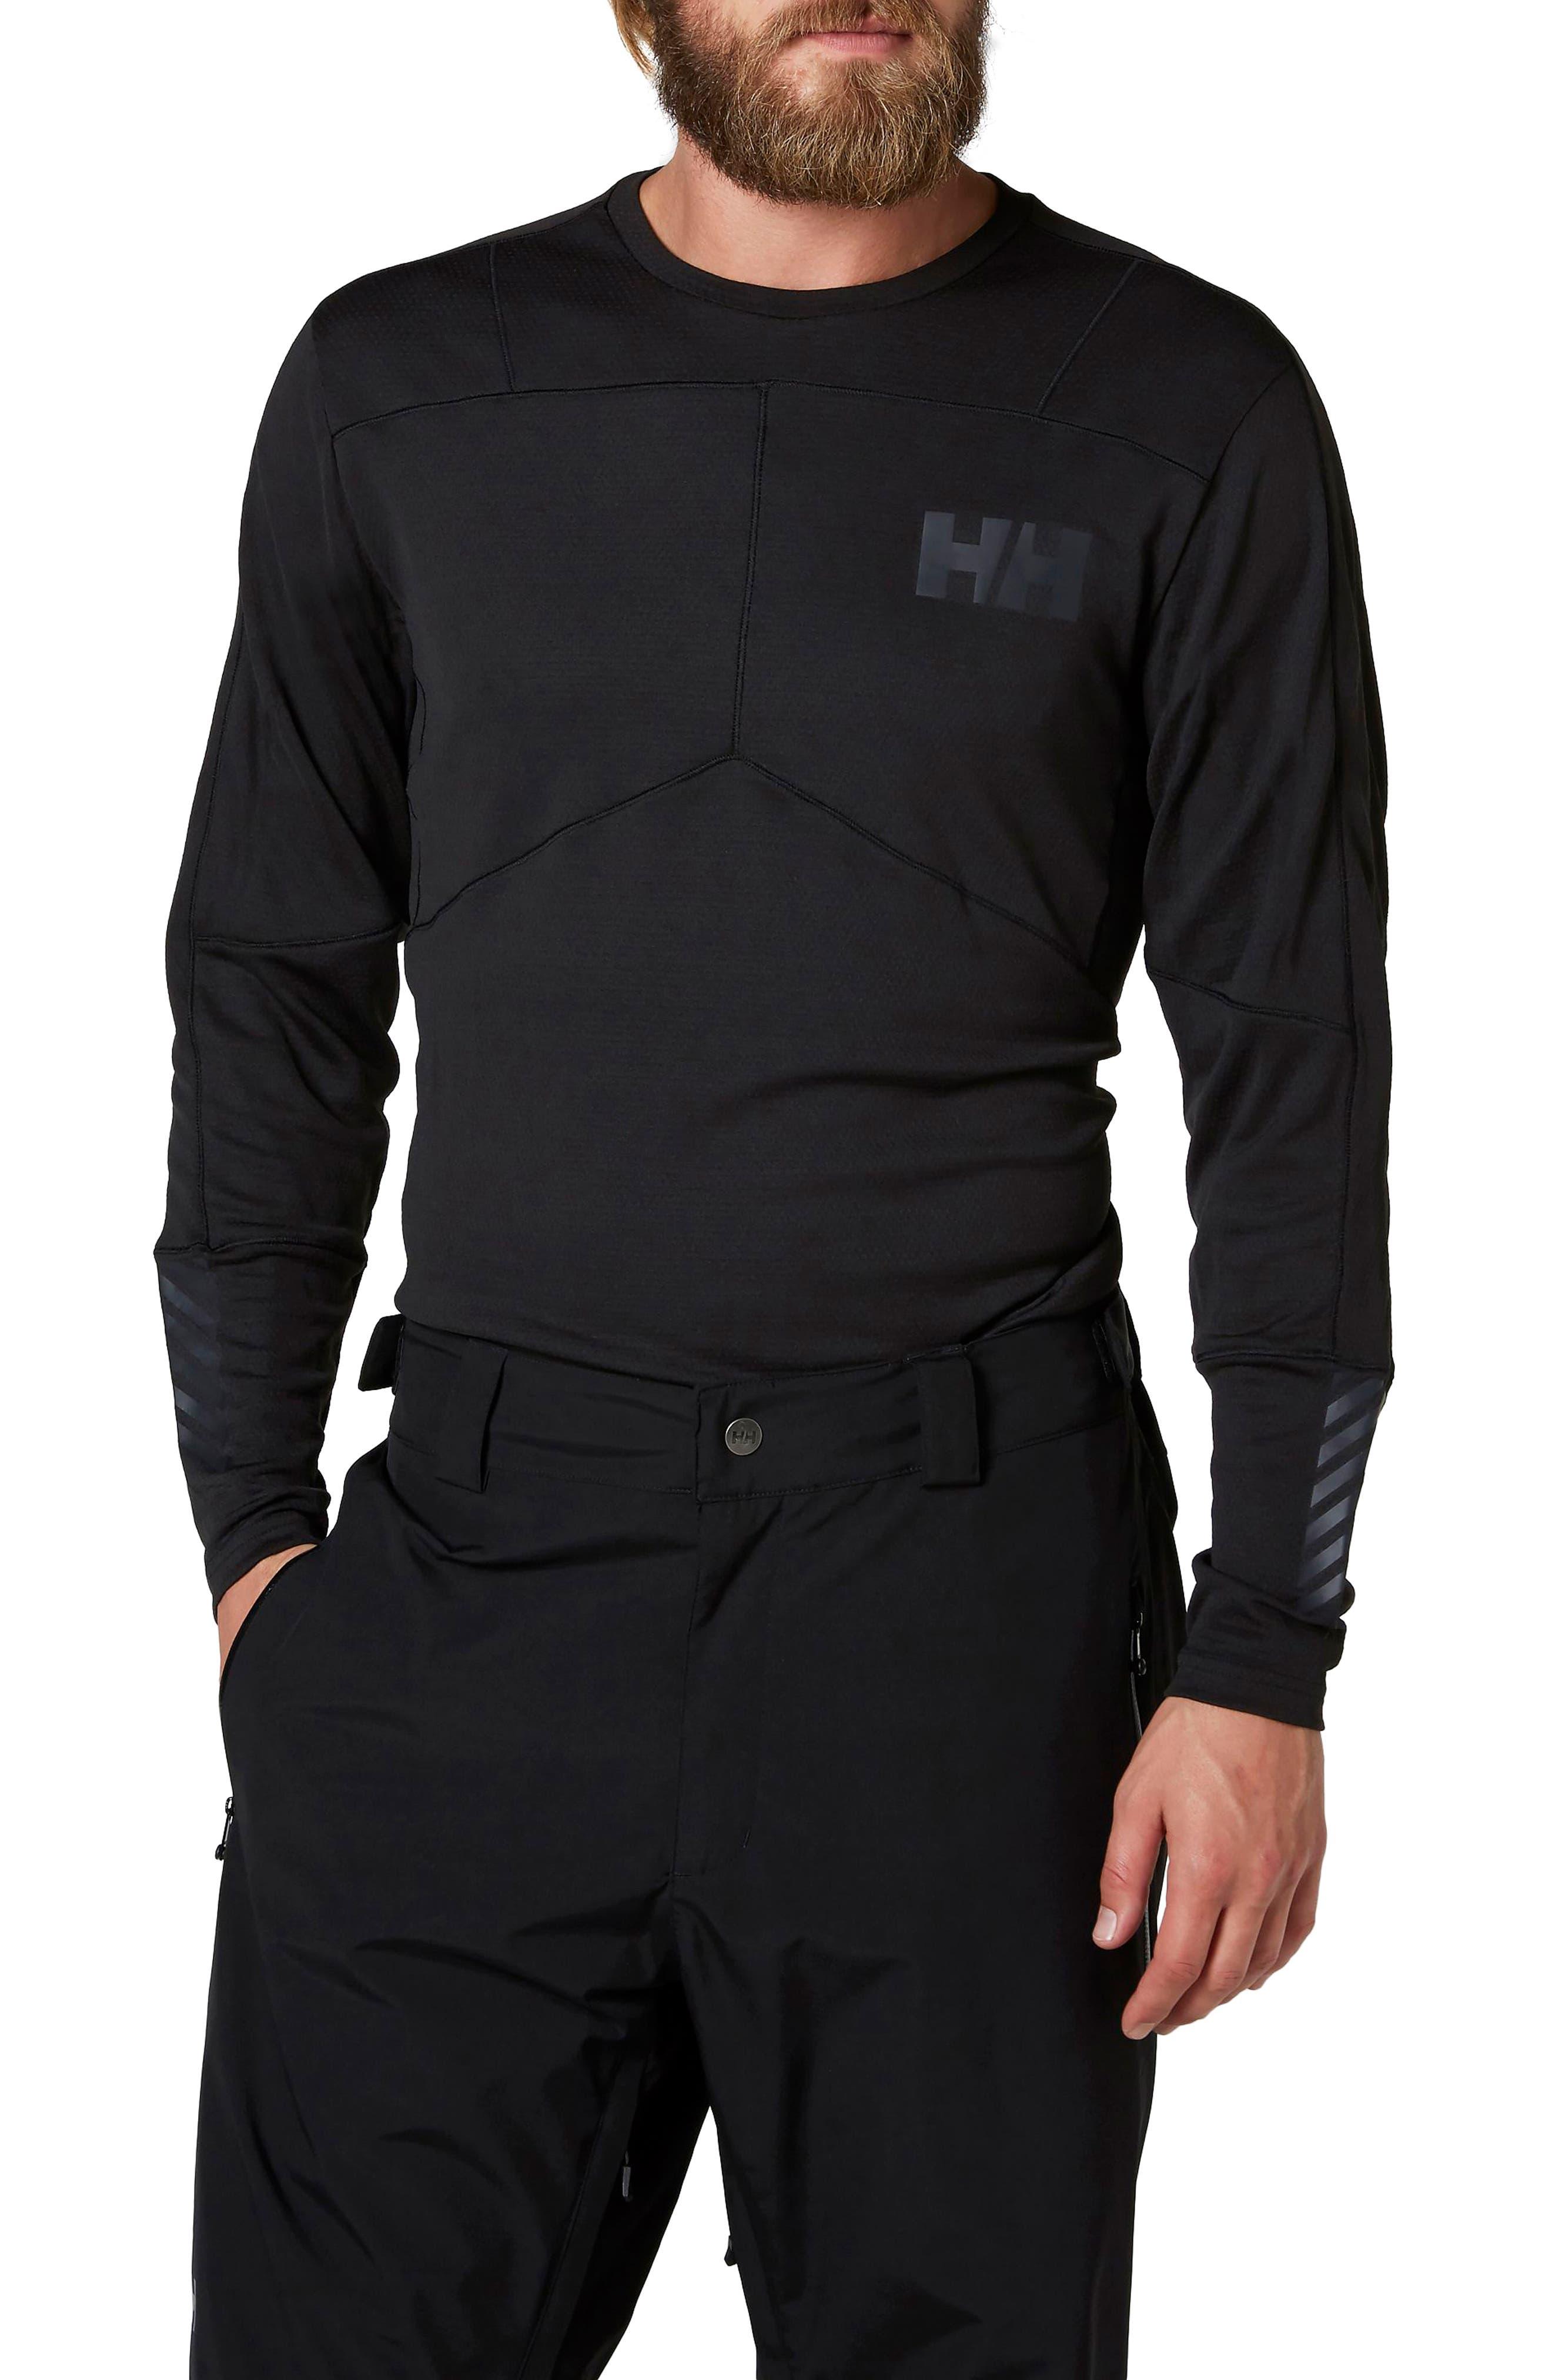 Alternate Image 1 Selected - Helly Hansen Lifa® Mid Long Sleeve Base Layer Shirt